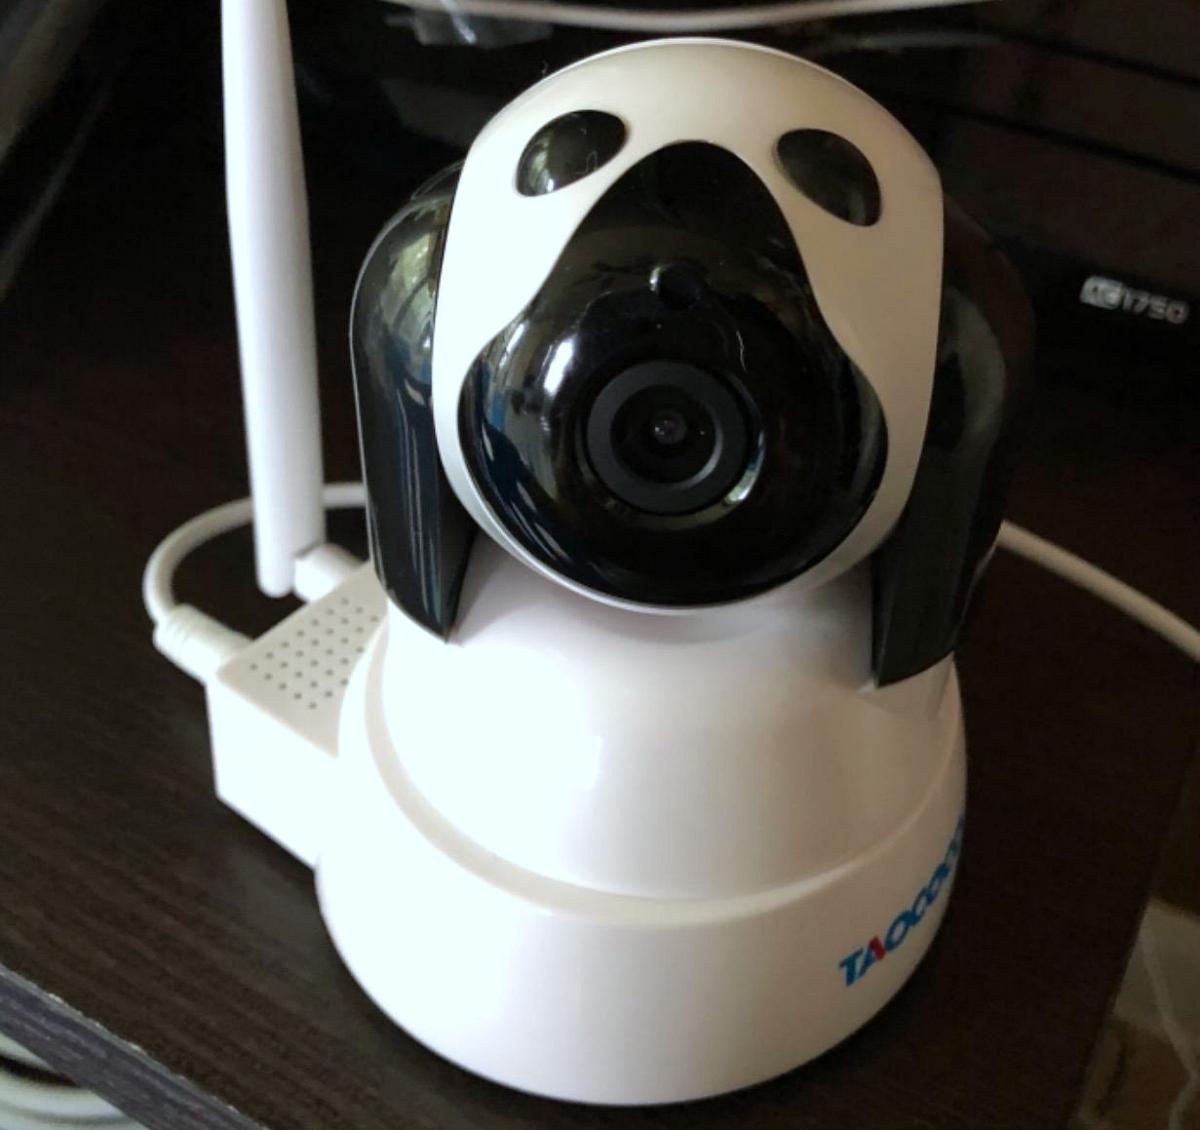 taococo dog camera that looks like robotic dog